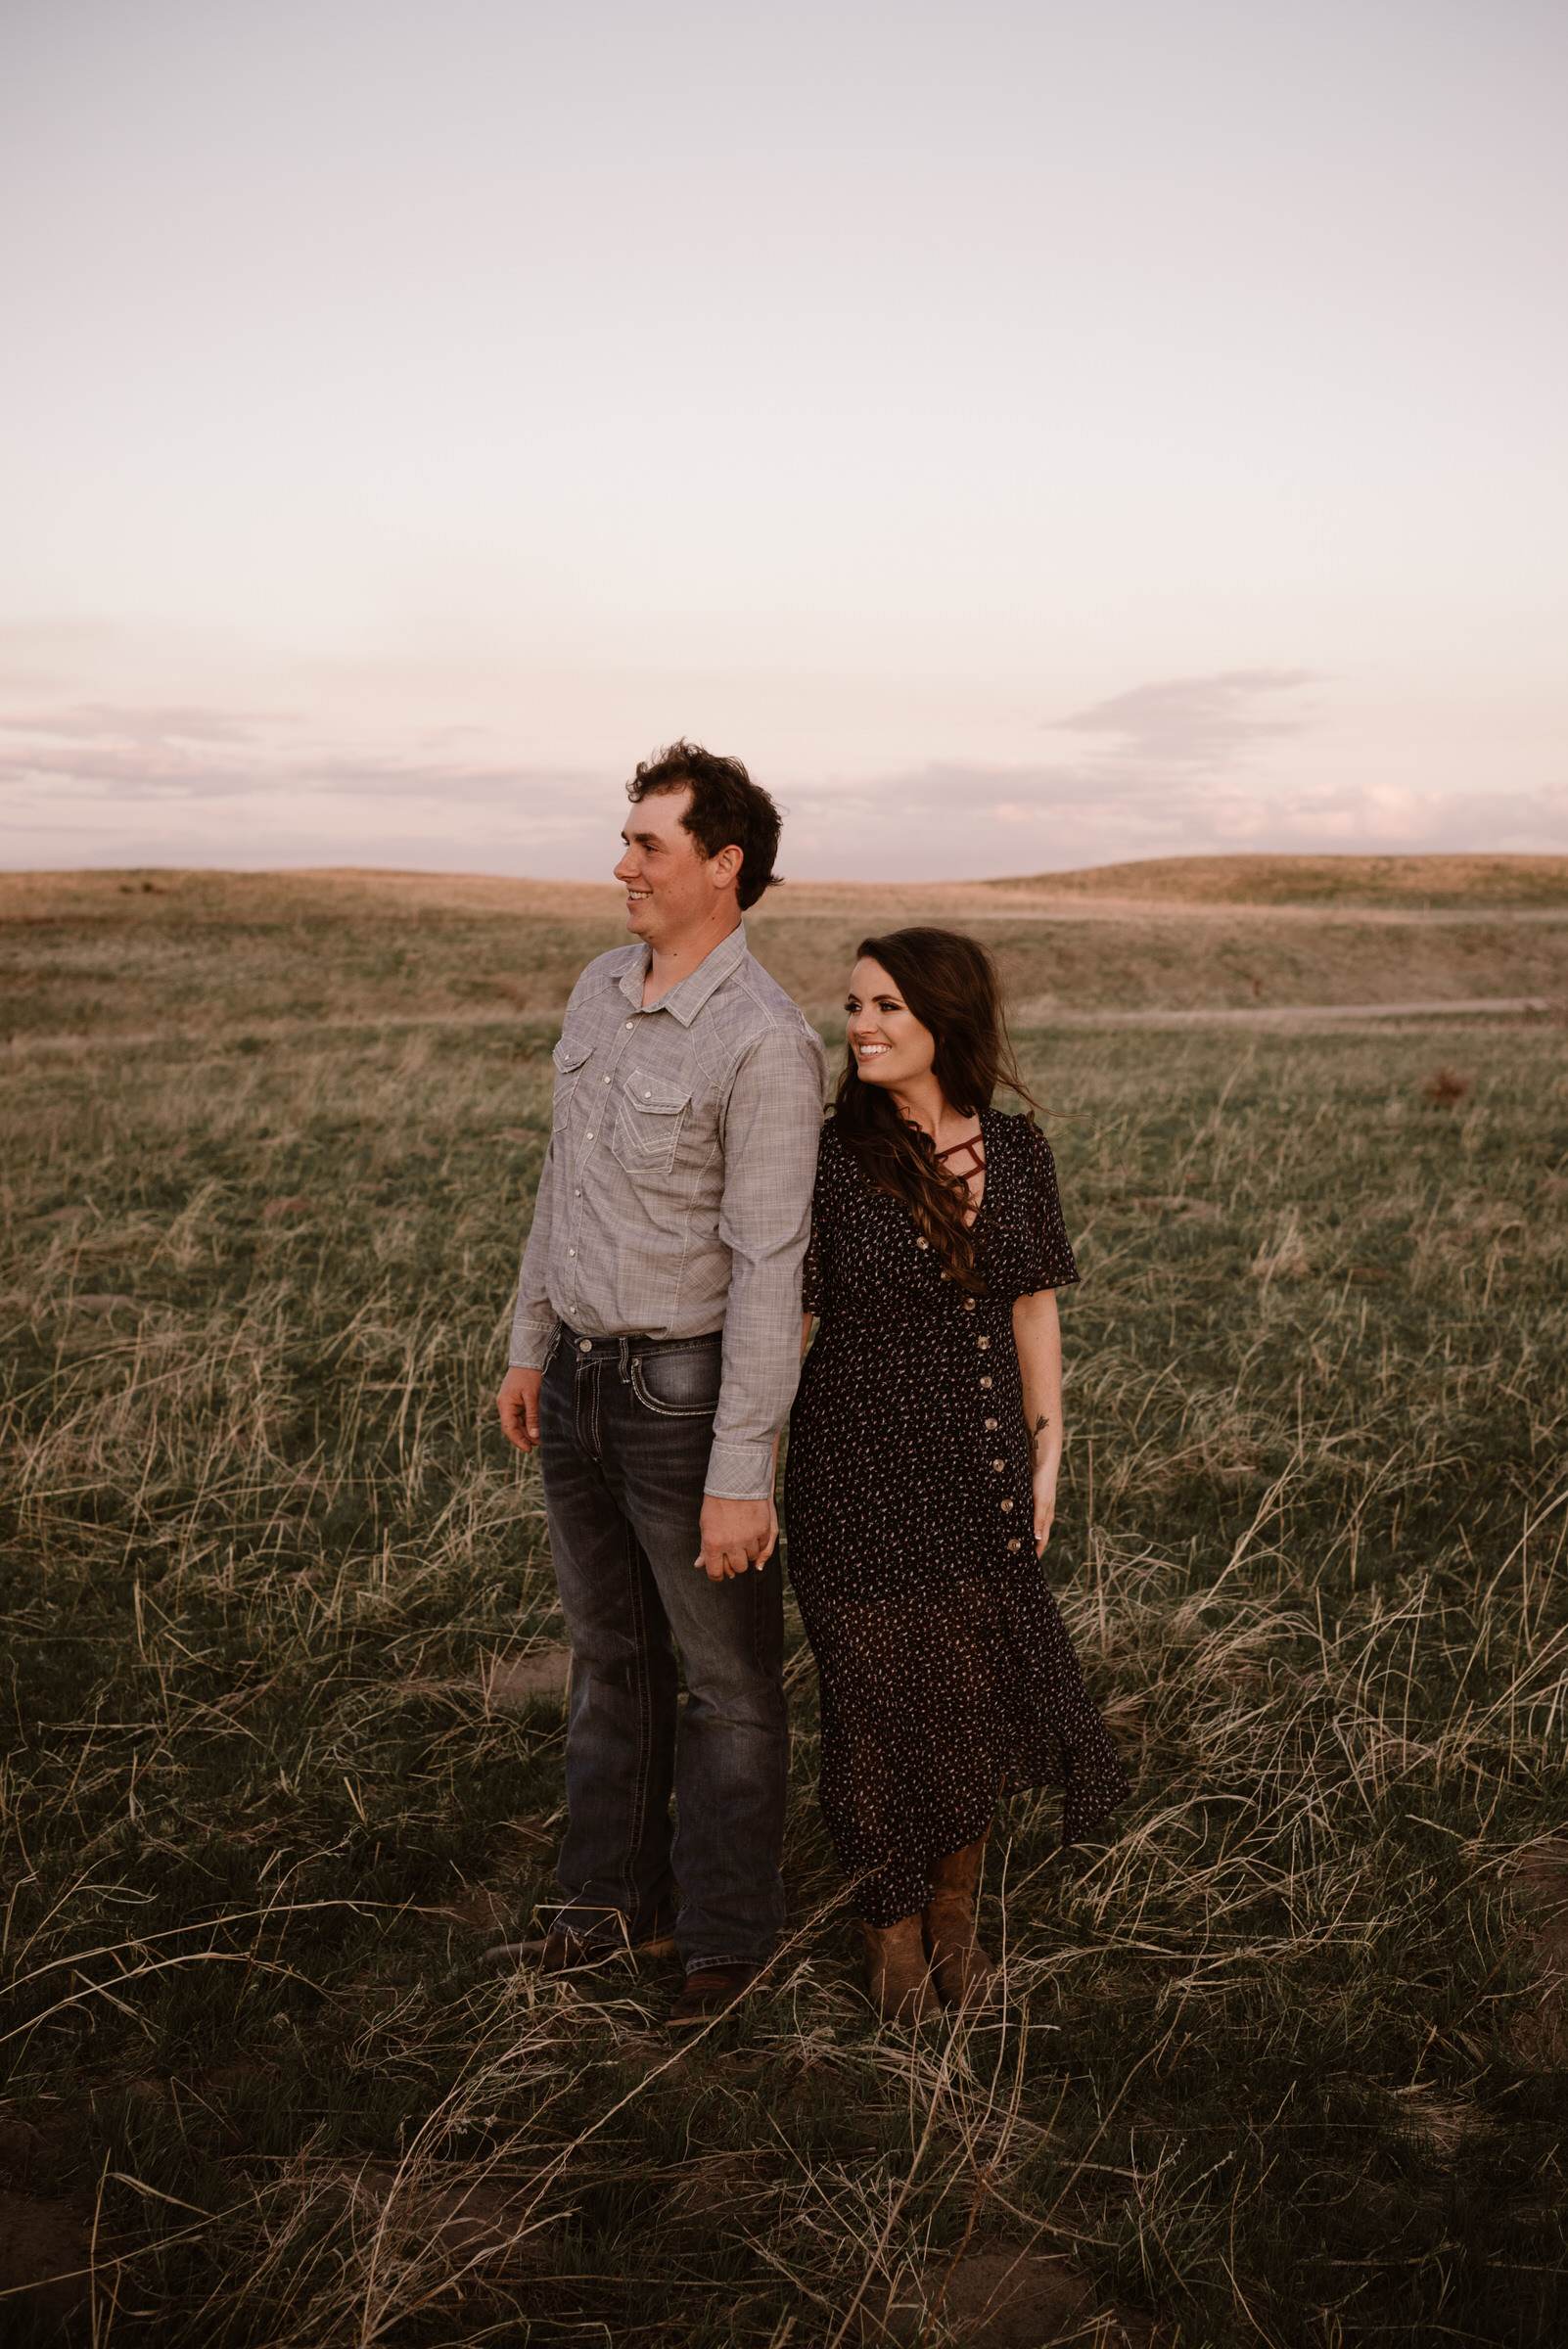 Sandhills-Nebraska-Engagement-Wedding-Photographer-Kaylie-Sirek-Photography-043.jpg